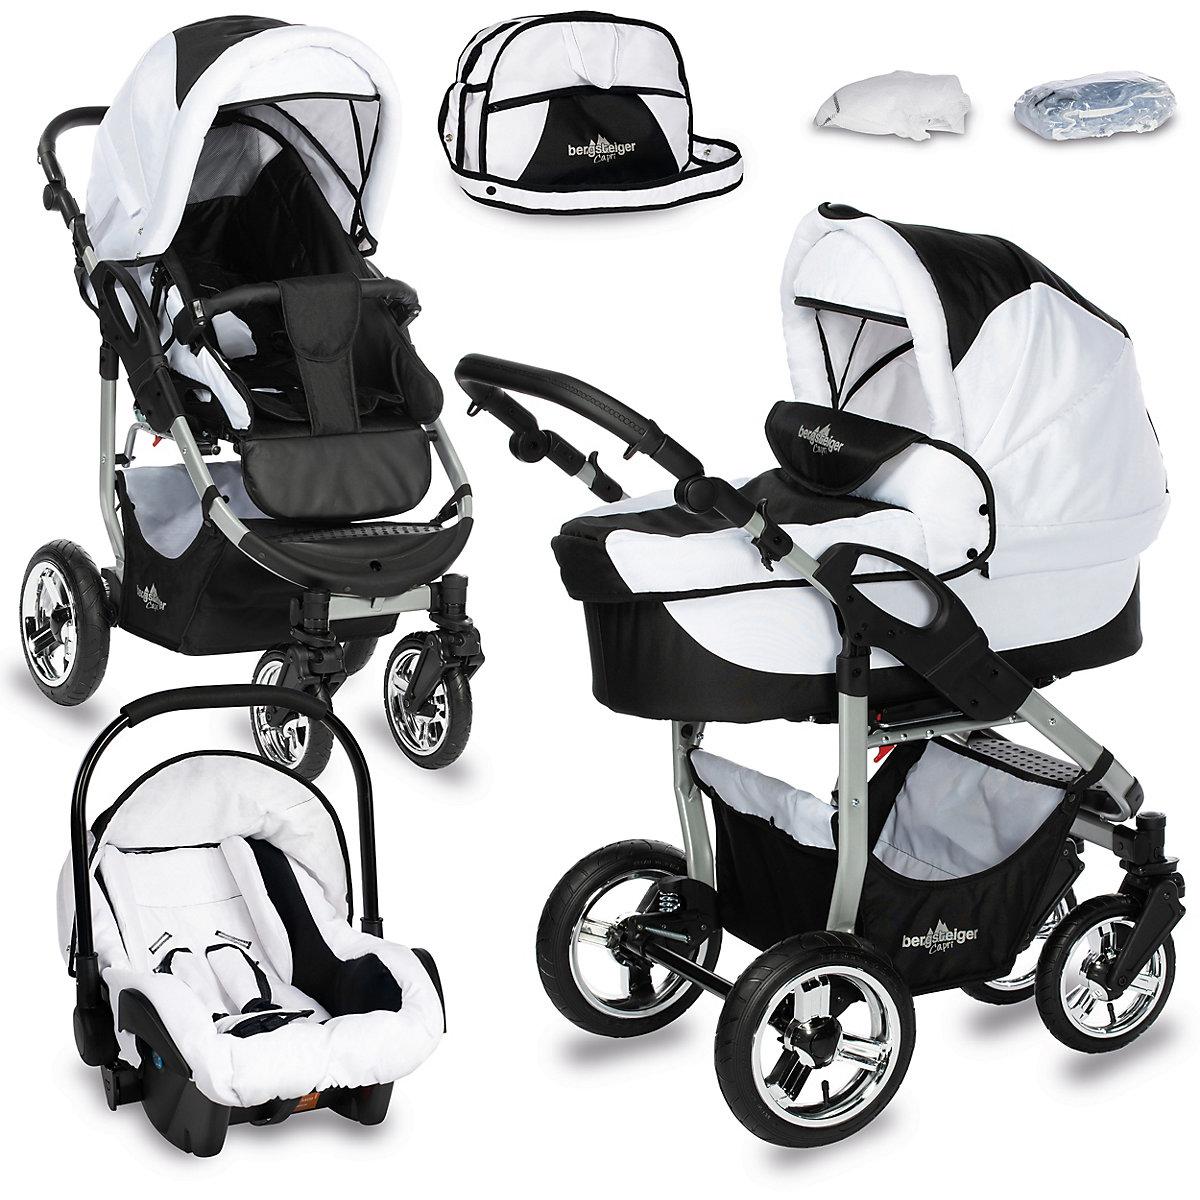 kombi kinderwagen capri 10 tlg black white bergsteiger mytoys. Black Bedroom Furniture Sets. Home Design Ideas